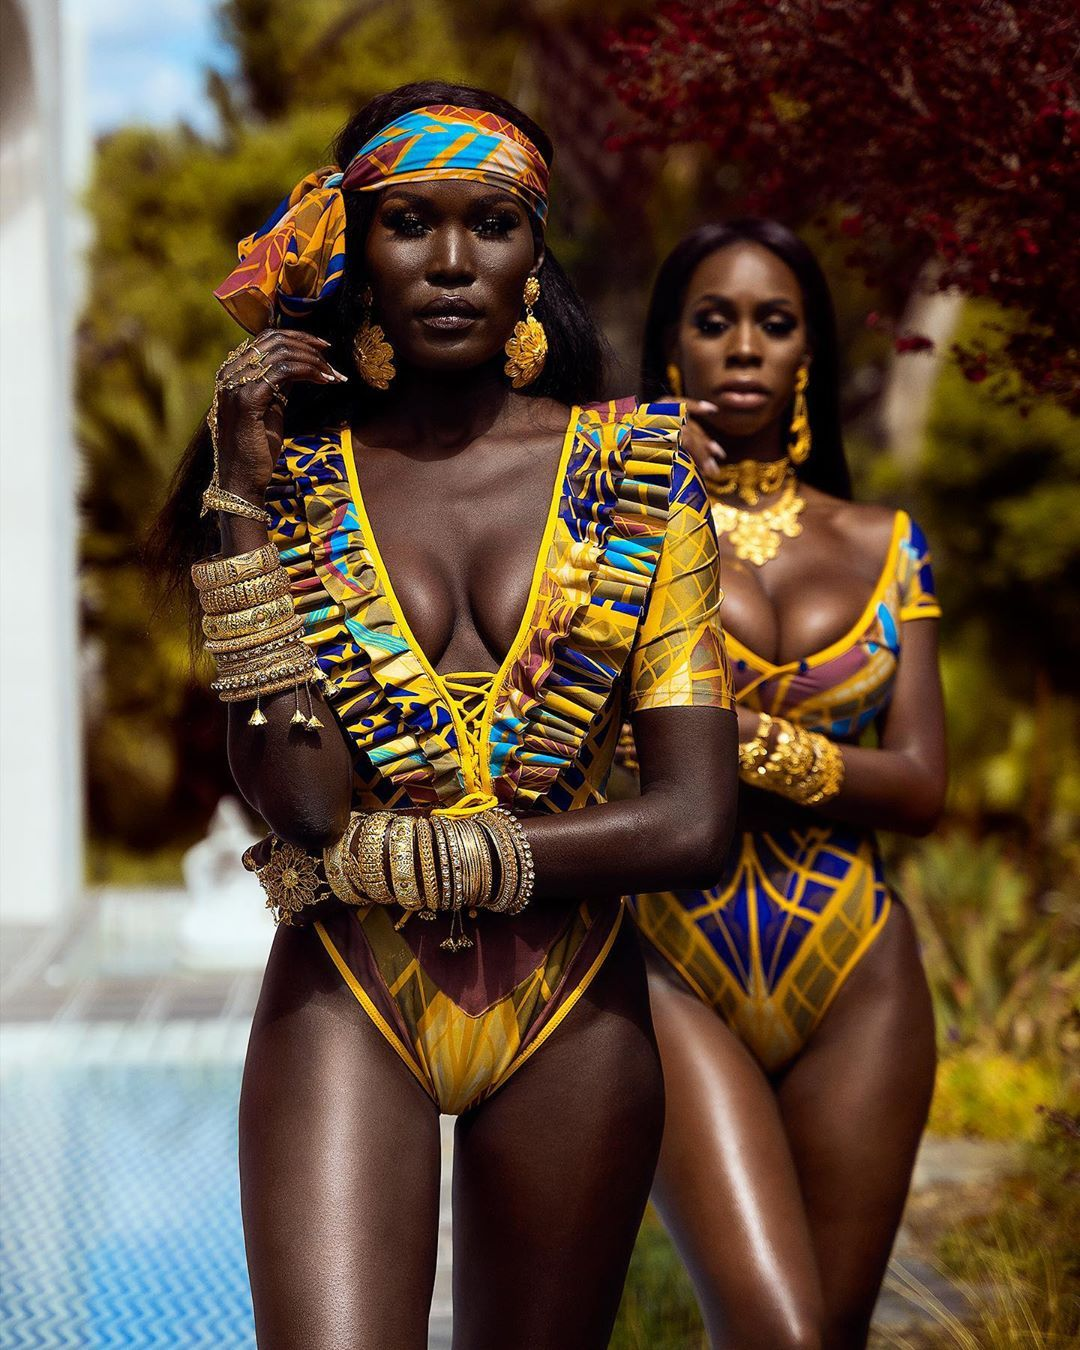 Pin By E S Booker On African Women Beautiful Black Girl